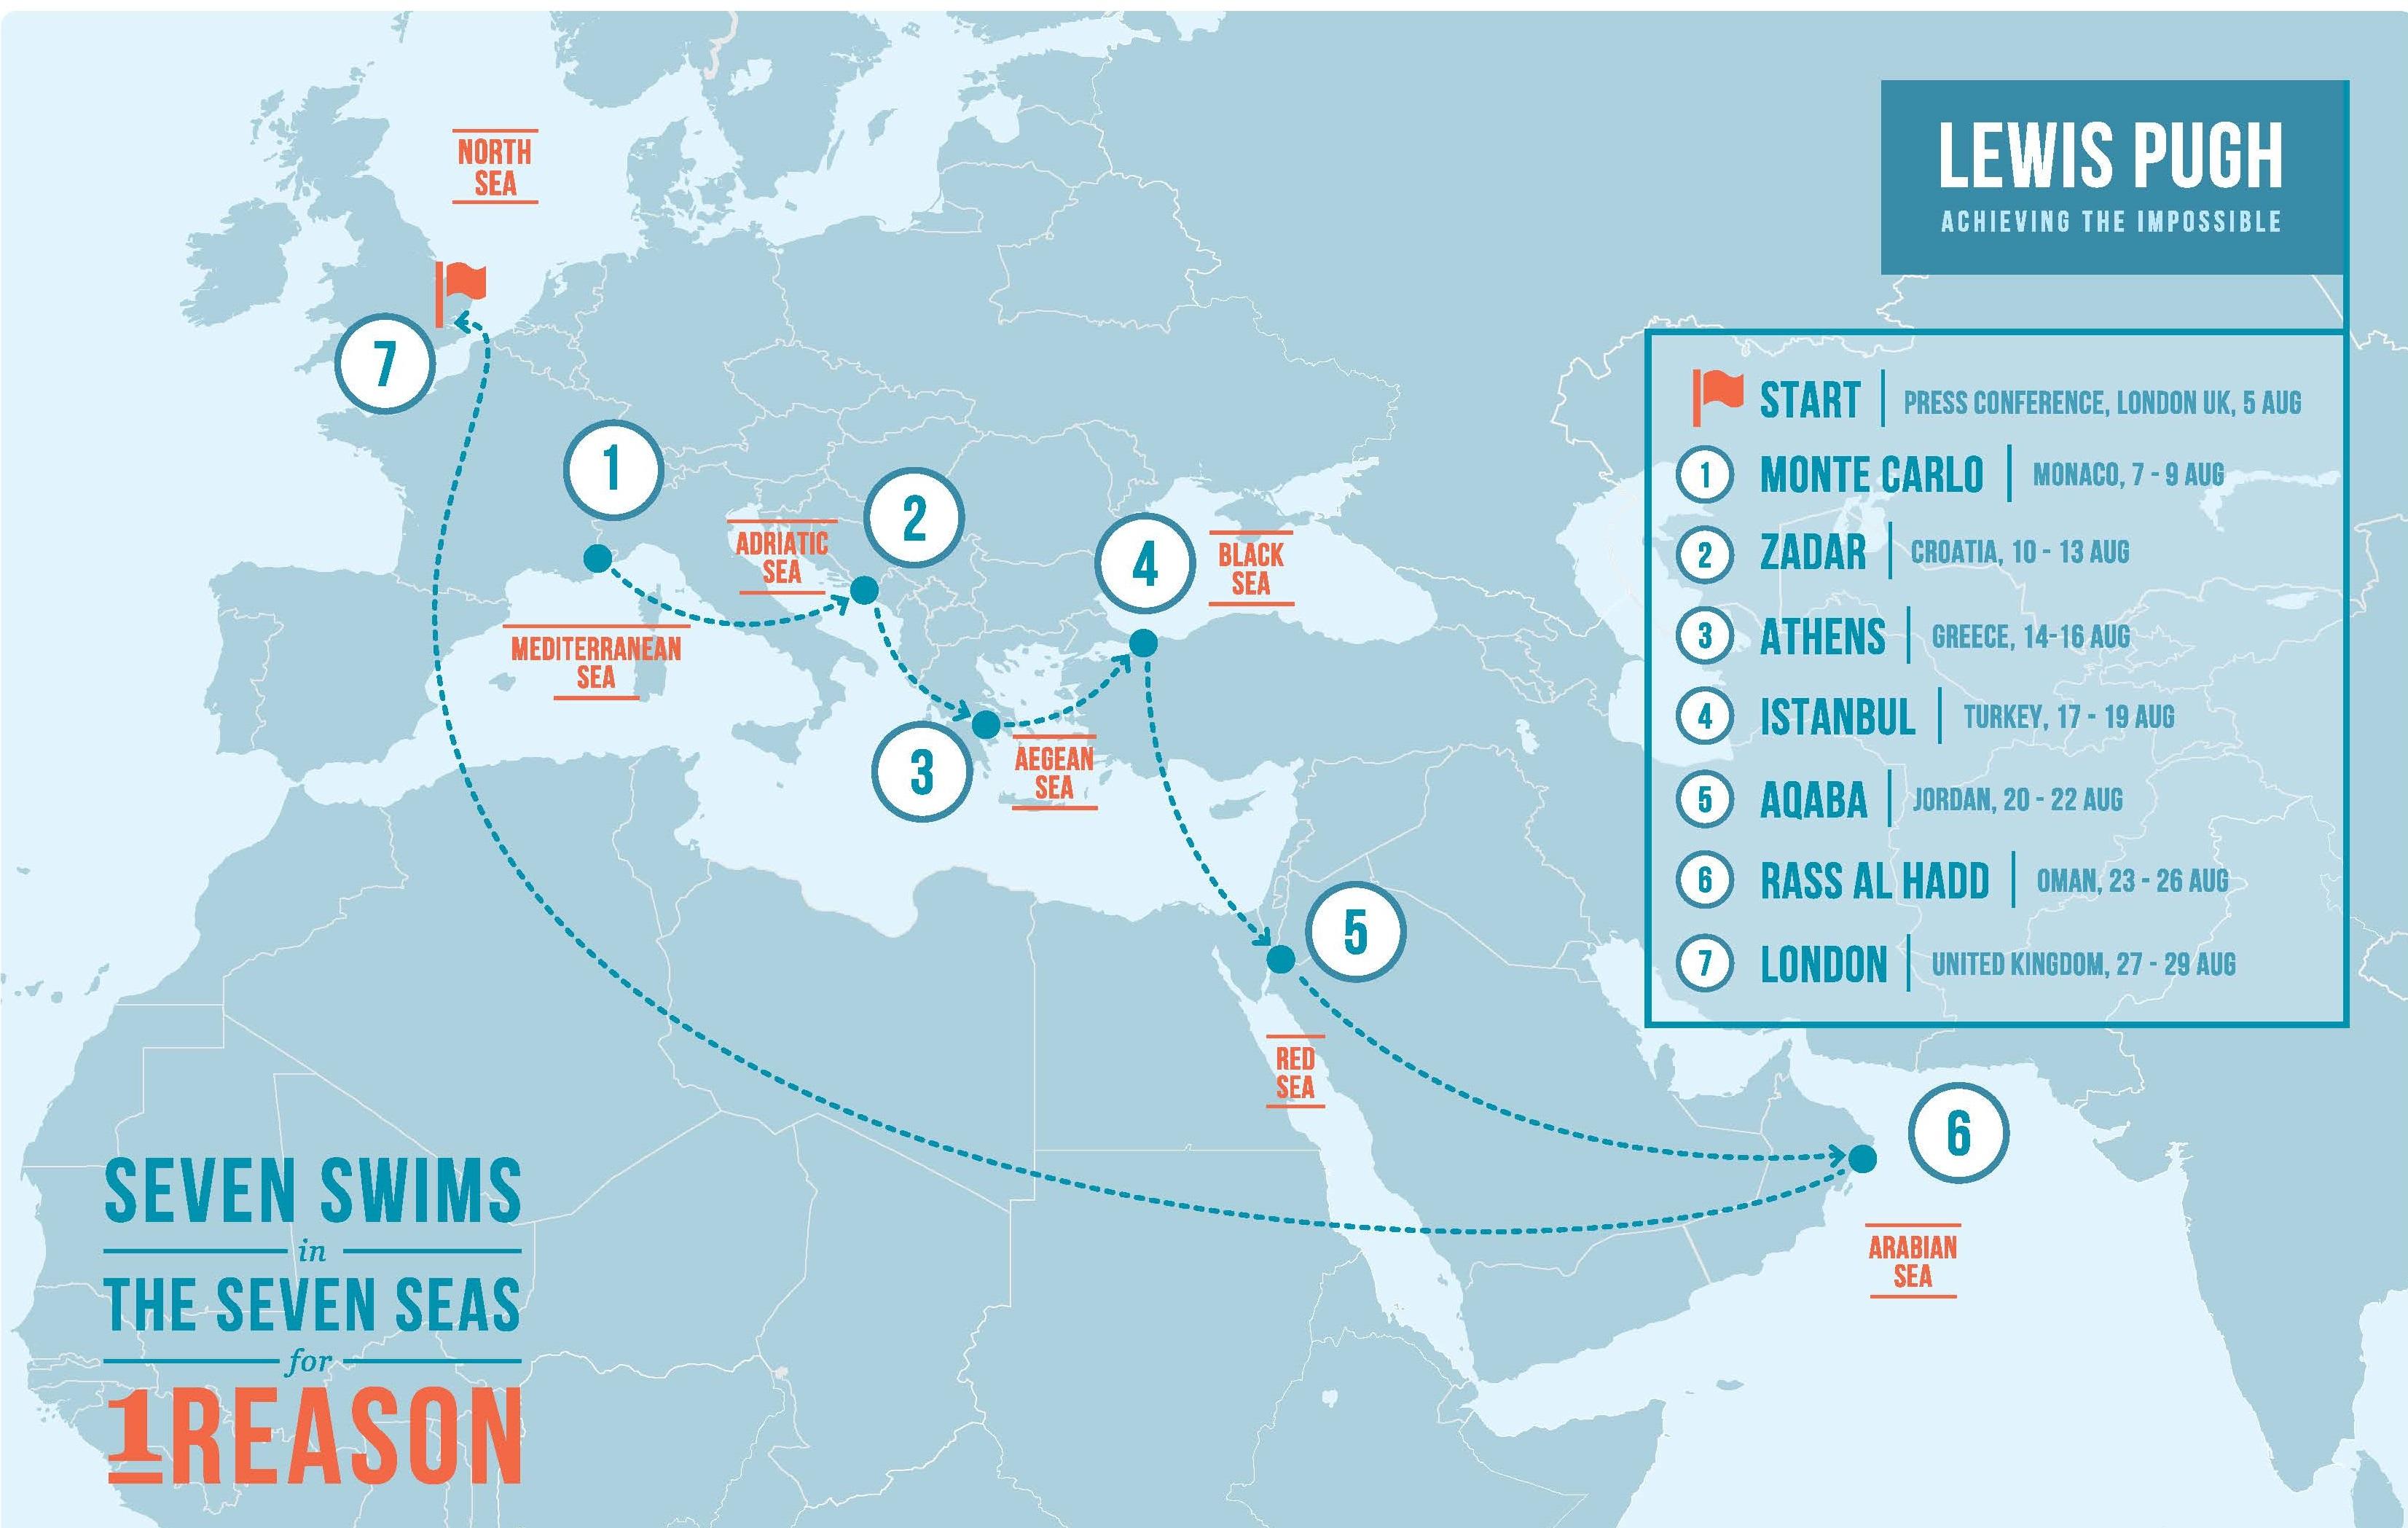 lewis push seven seas map